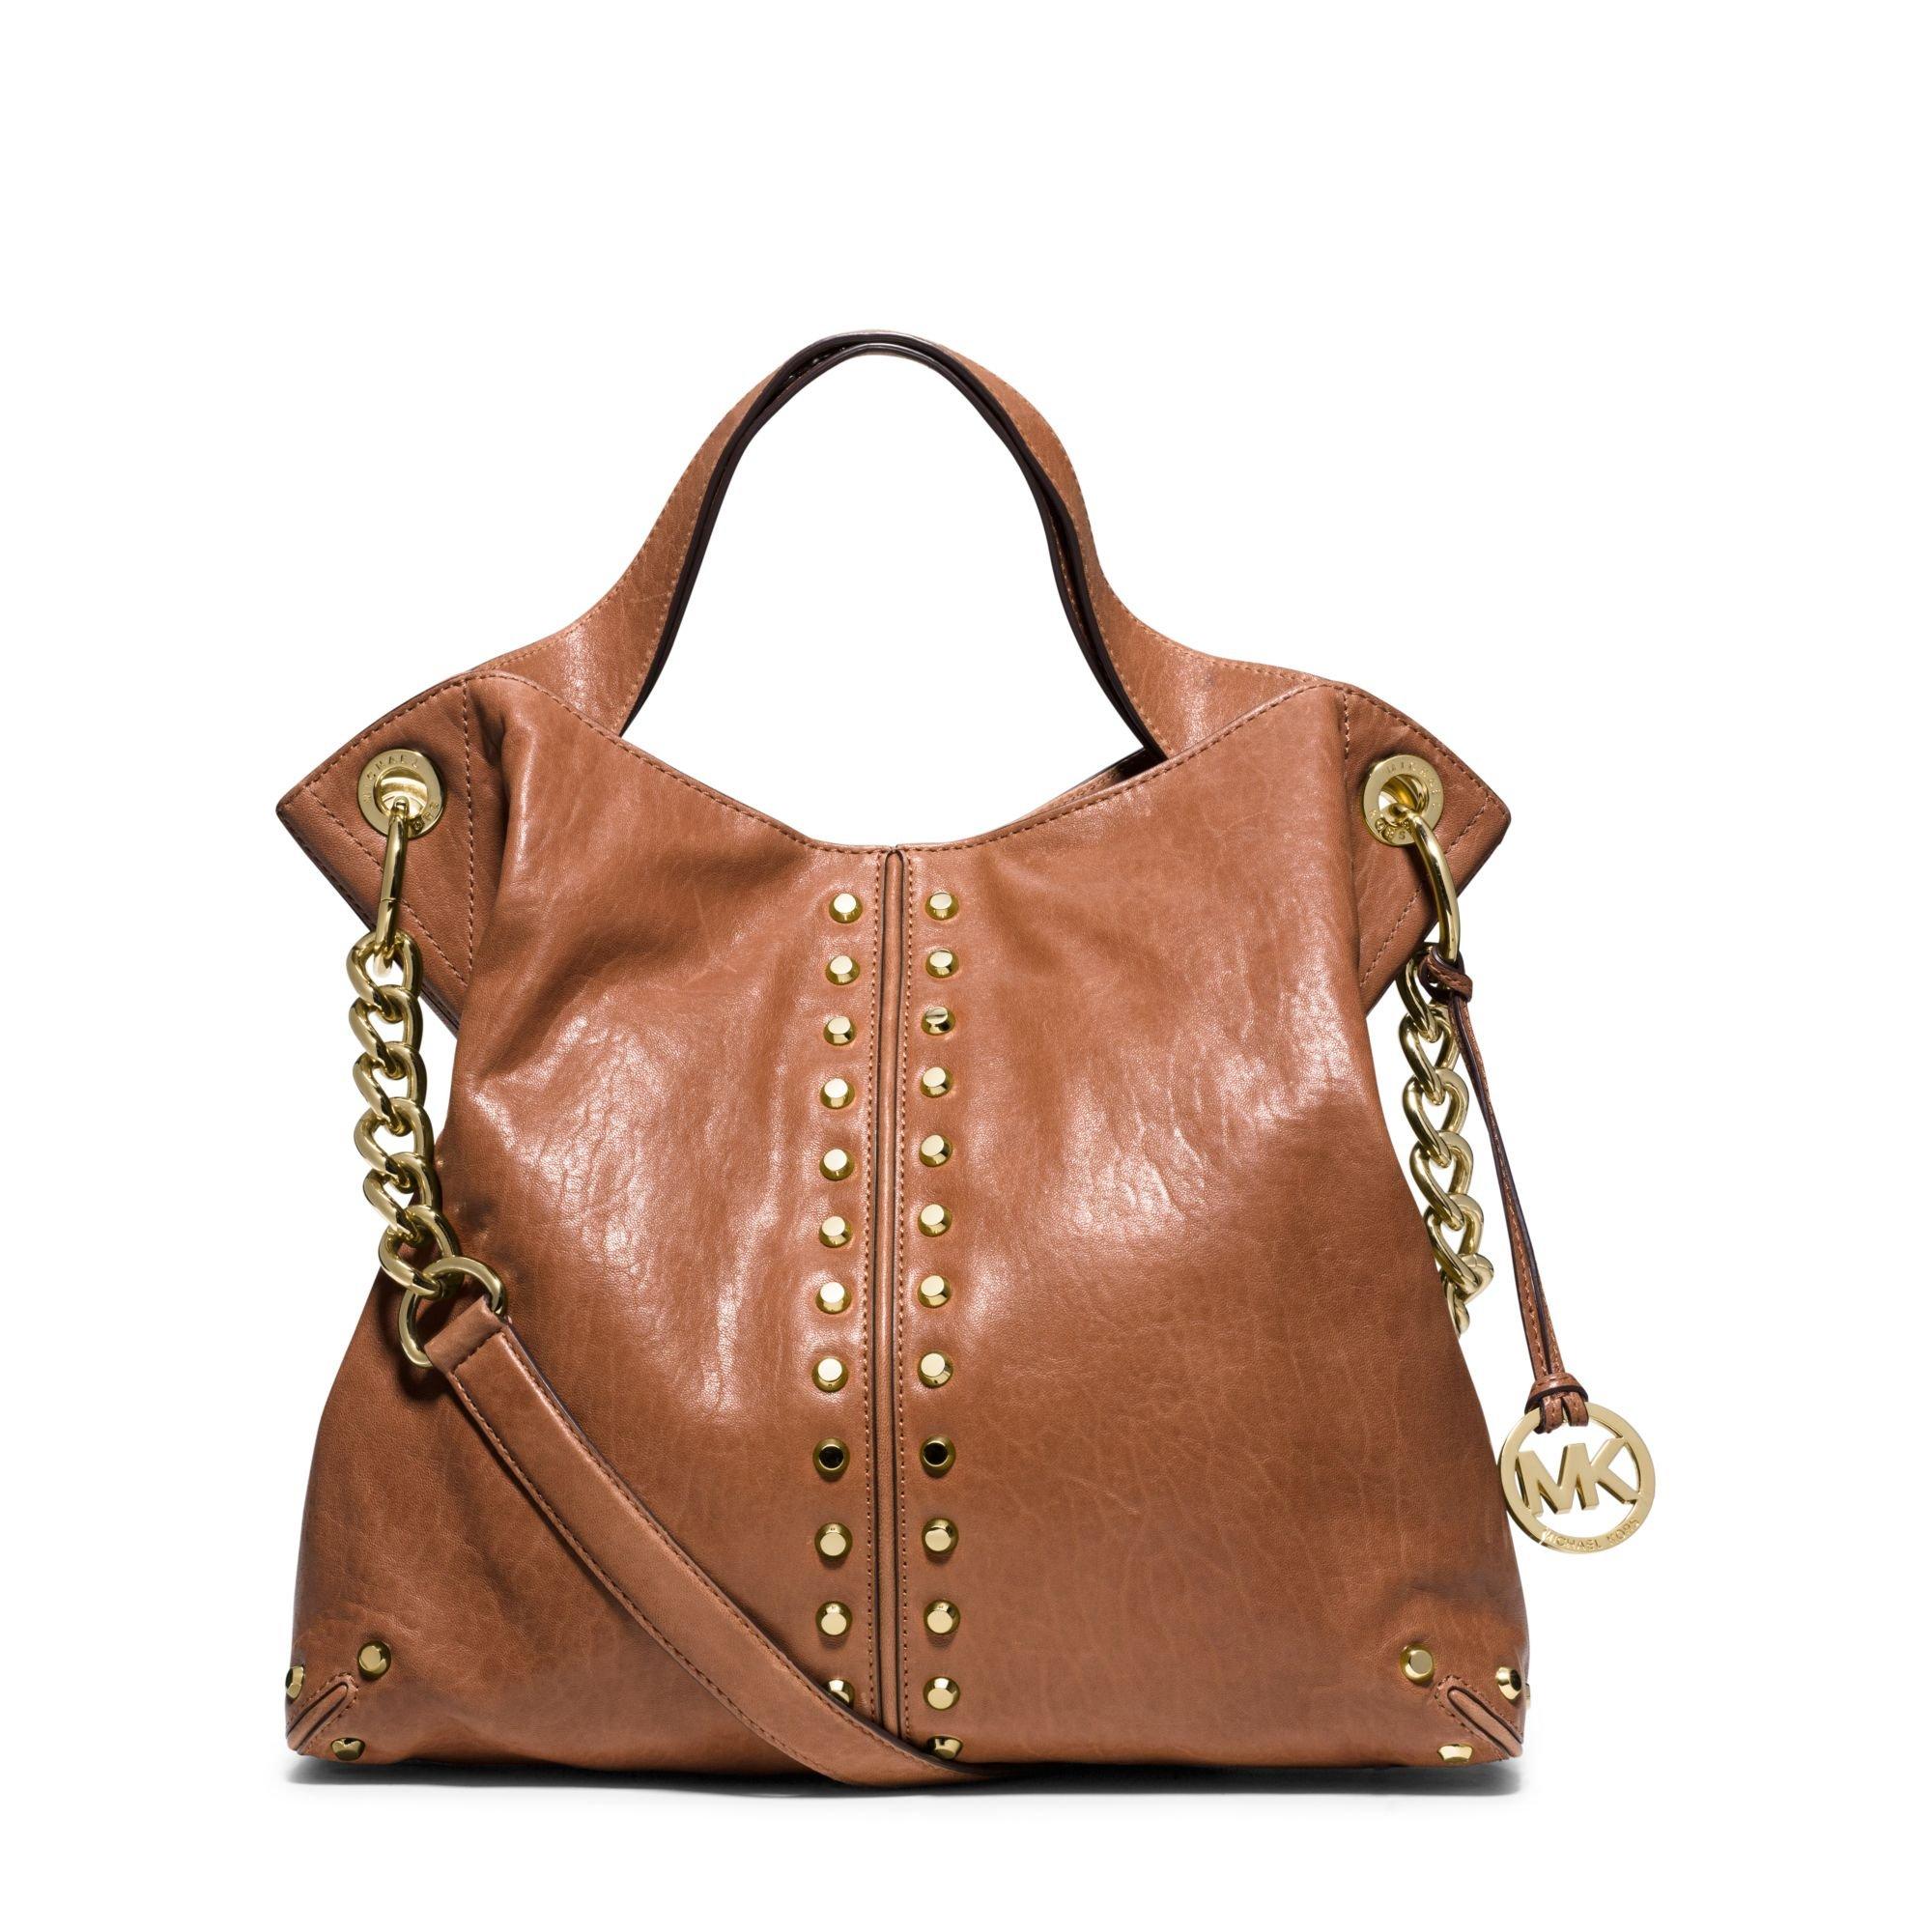 MICHAEL MICHAEL KORS Astor Leather Shoulder Handbag (Walnut) by MICHAEL Michael Kors